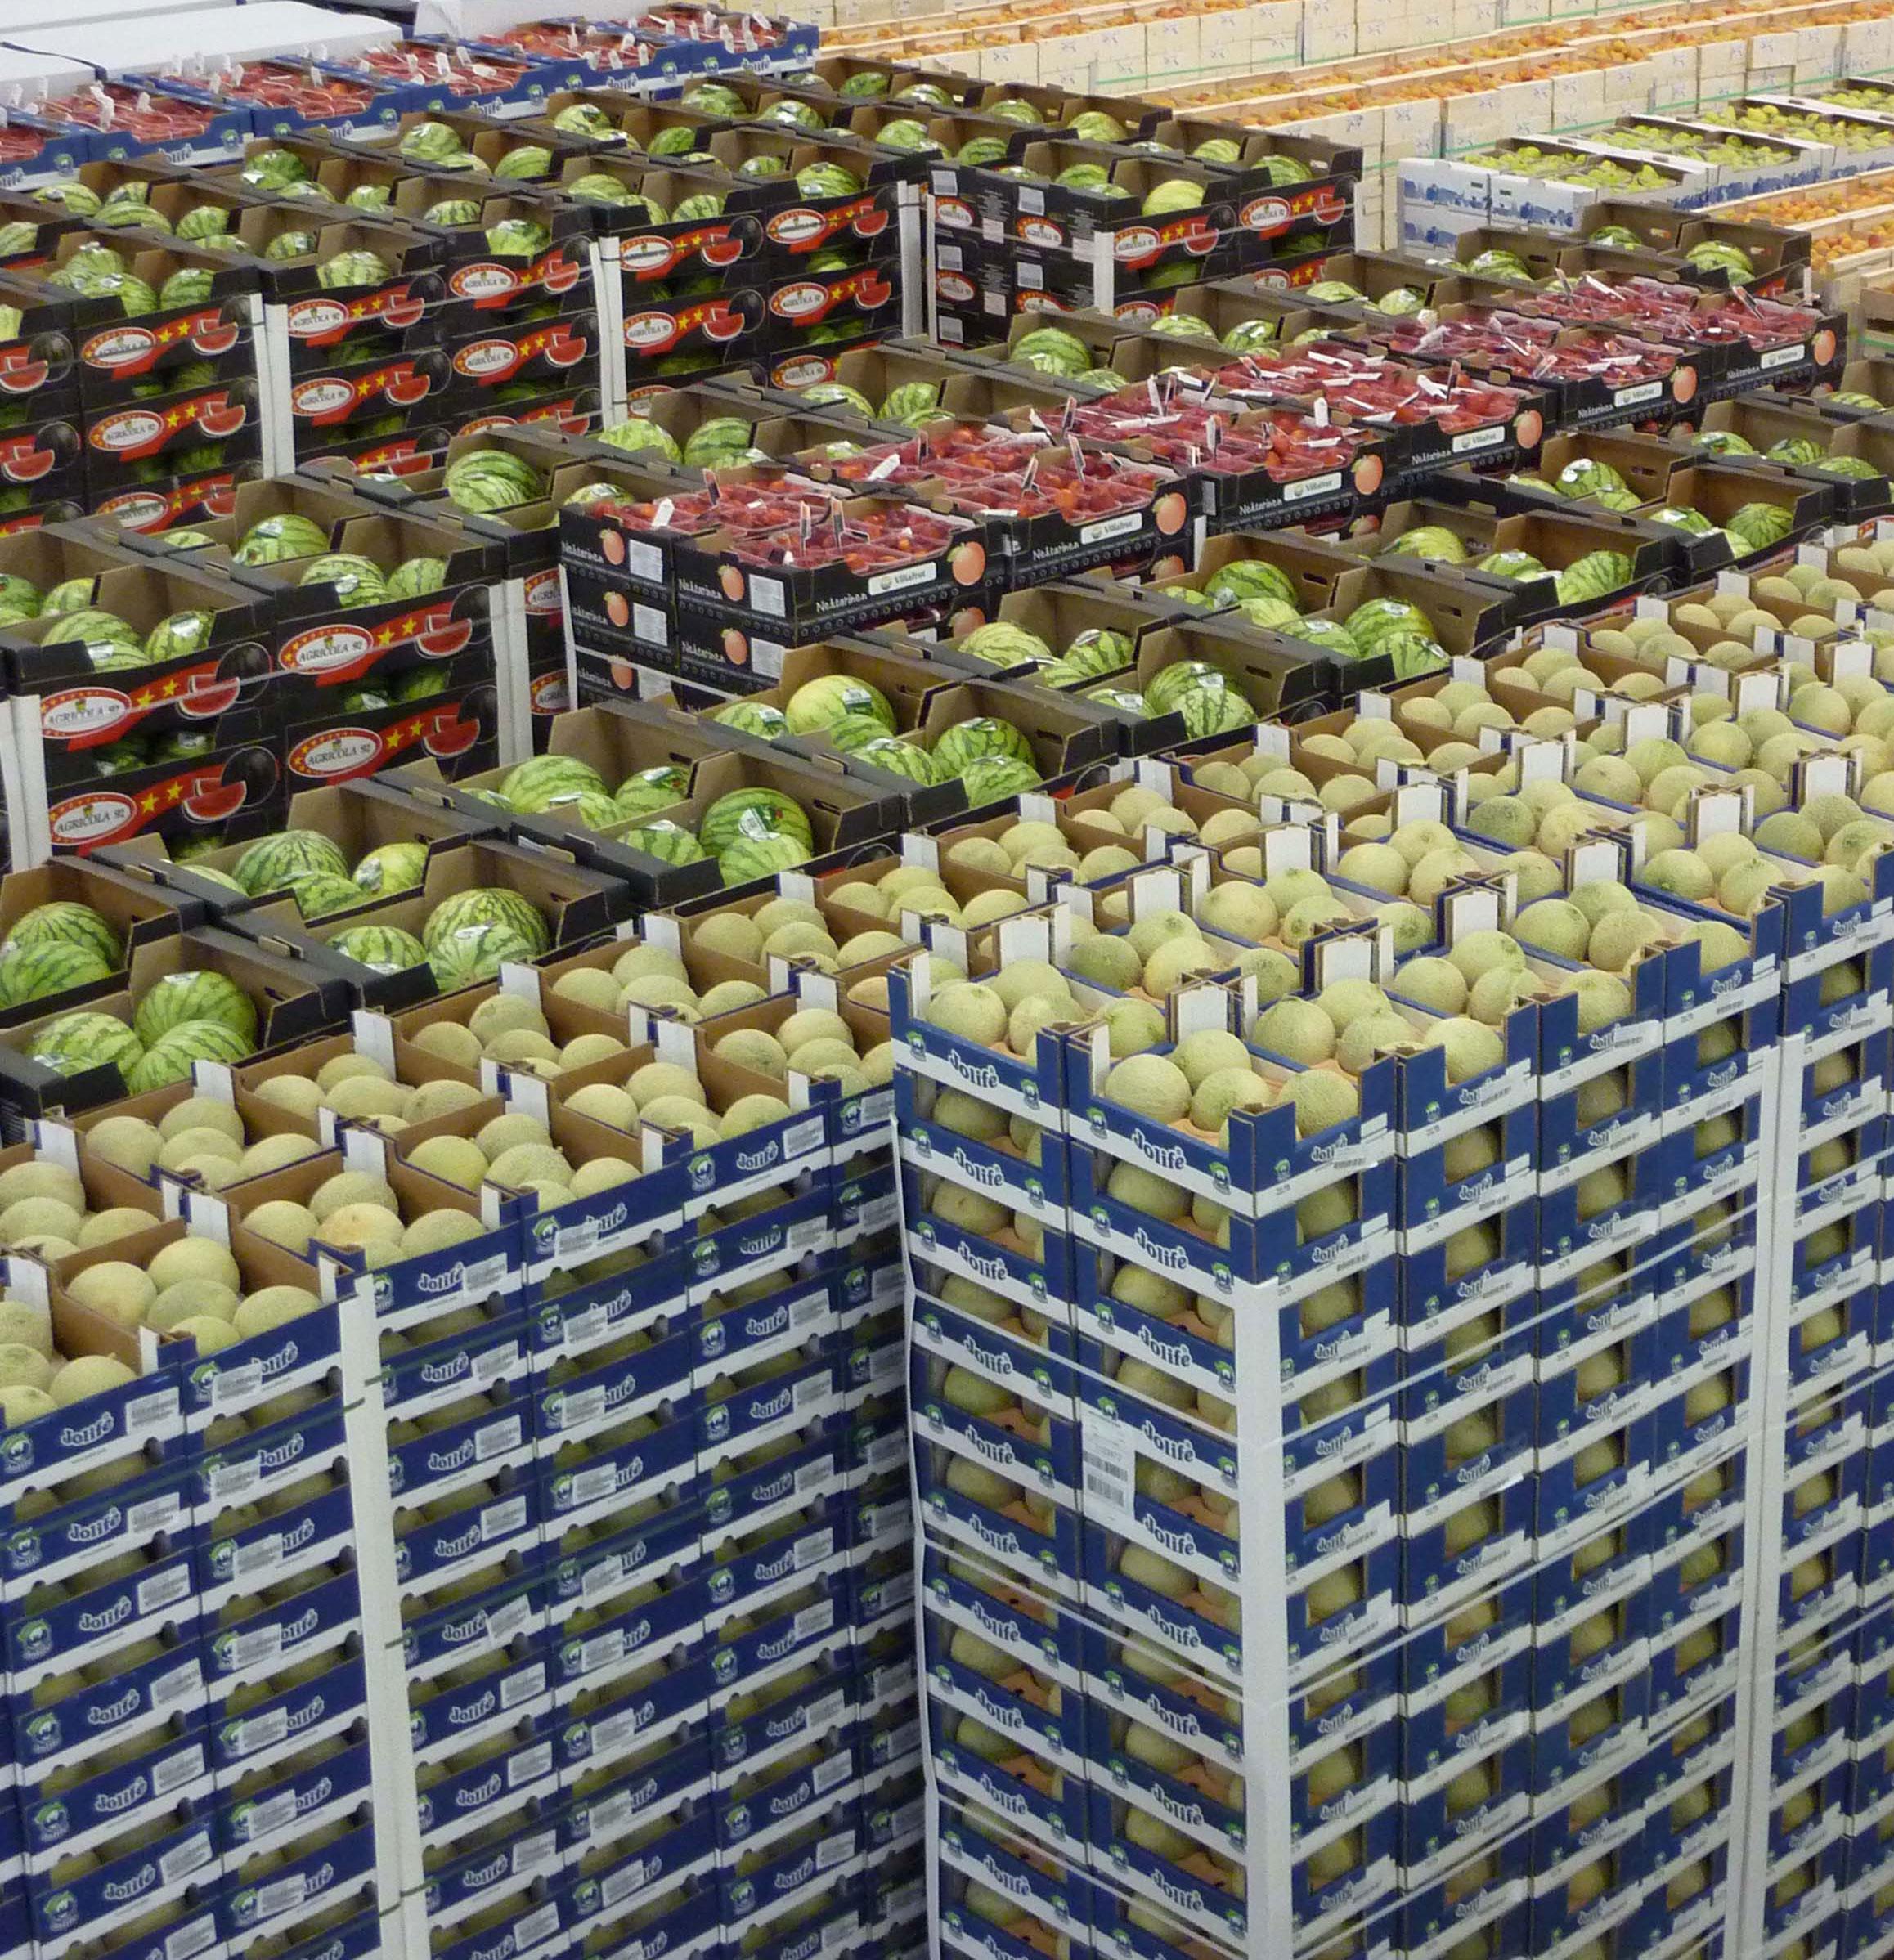 Fresh produce inventory